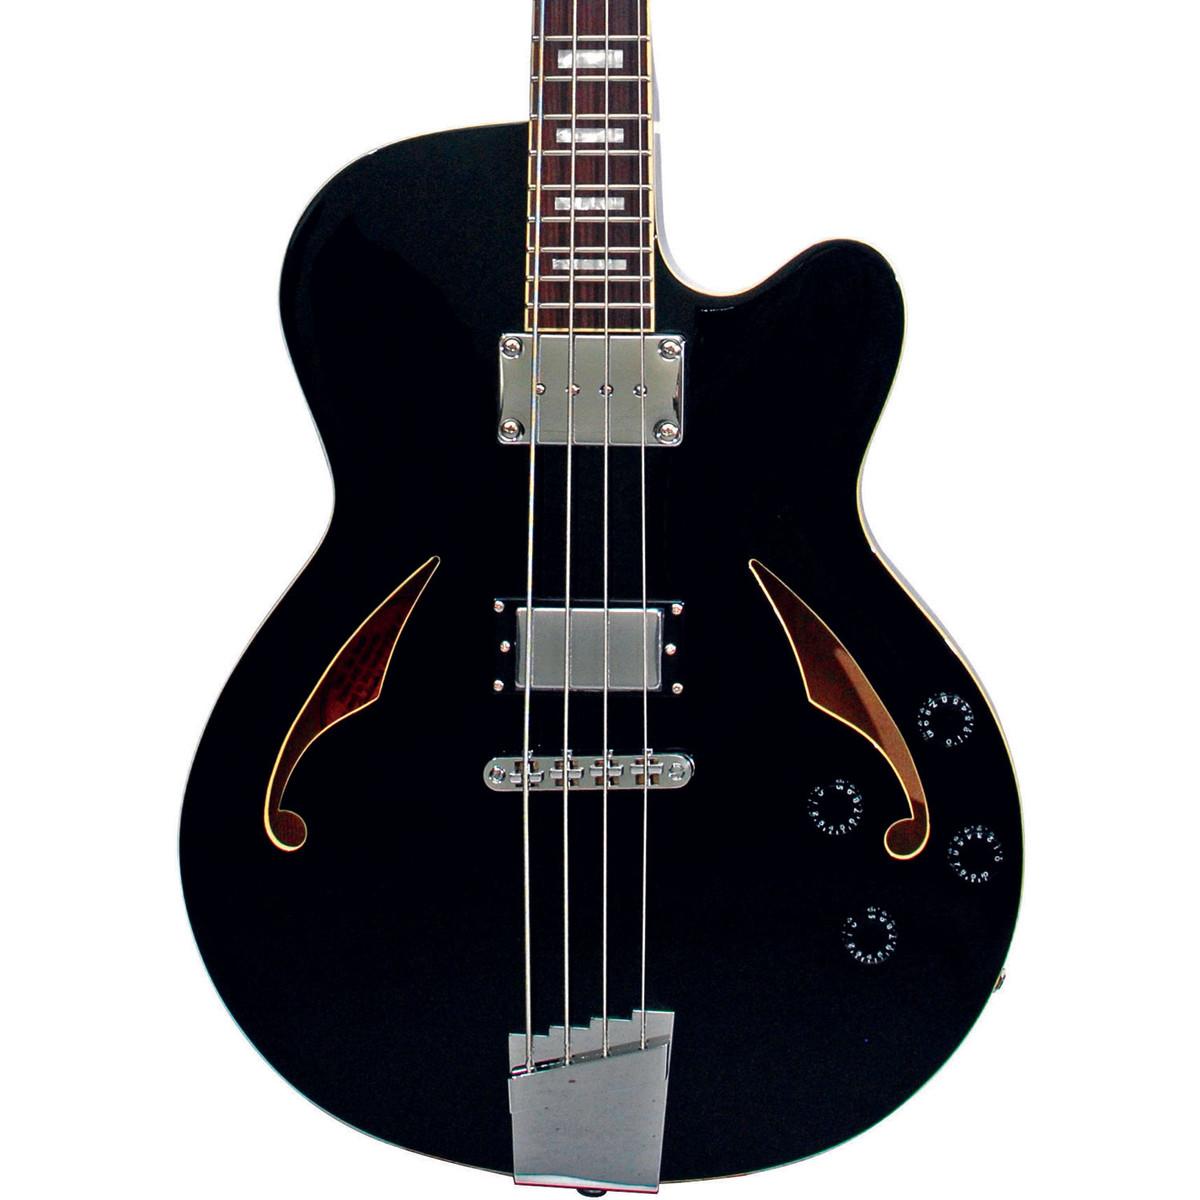 italia torino semi hollow body bass guitar black with gig bag at gear4music. Black Bedroom Furniture Sets. Home Design Ideas